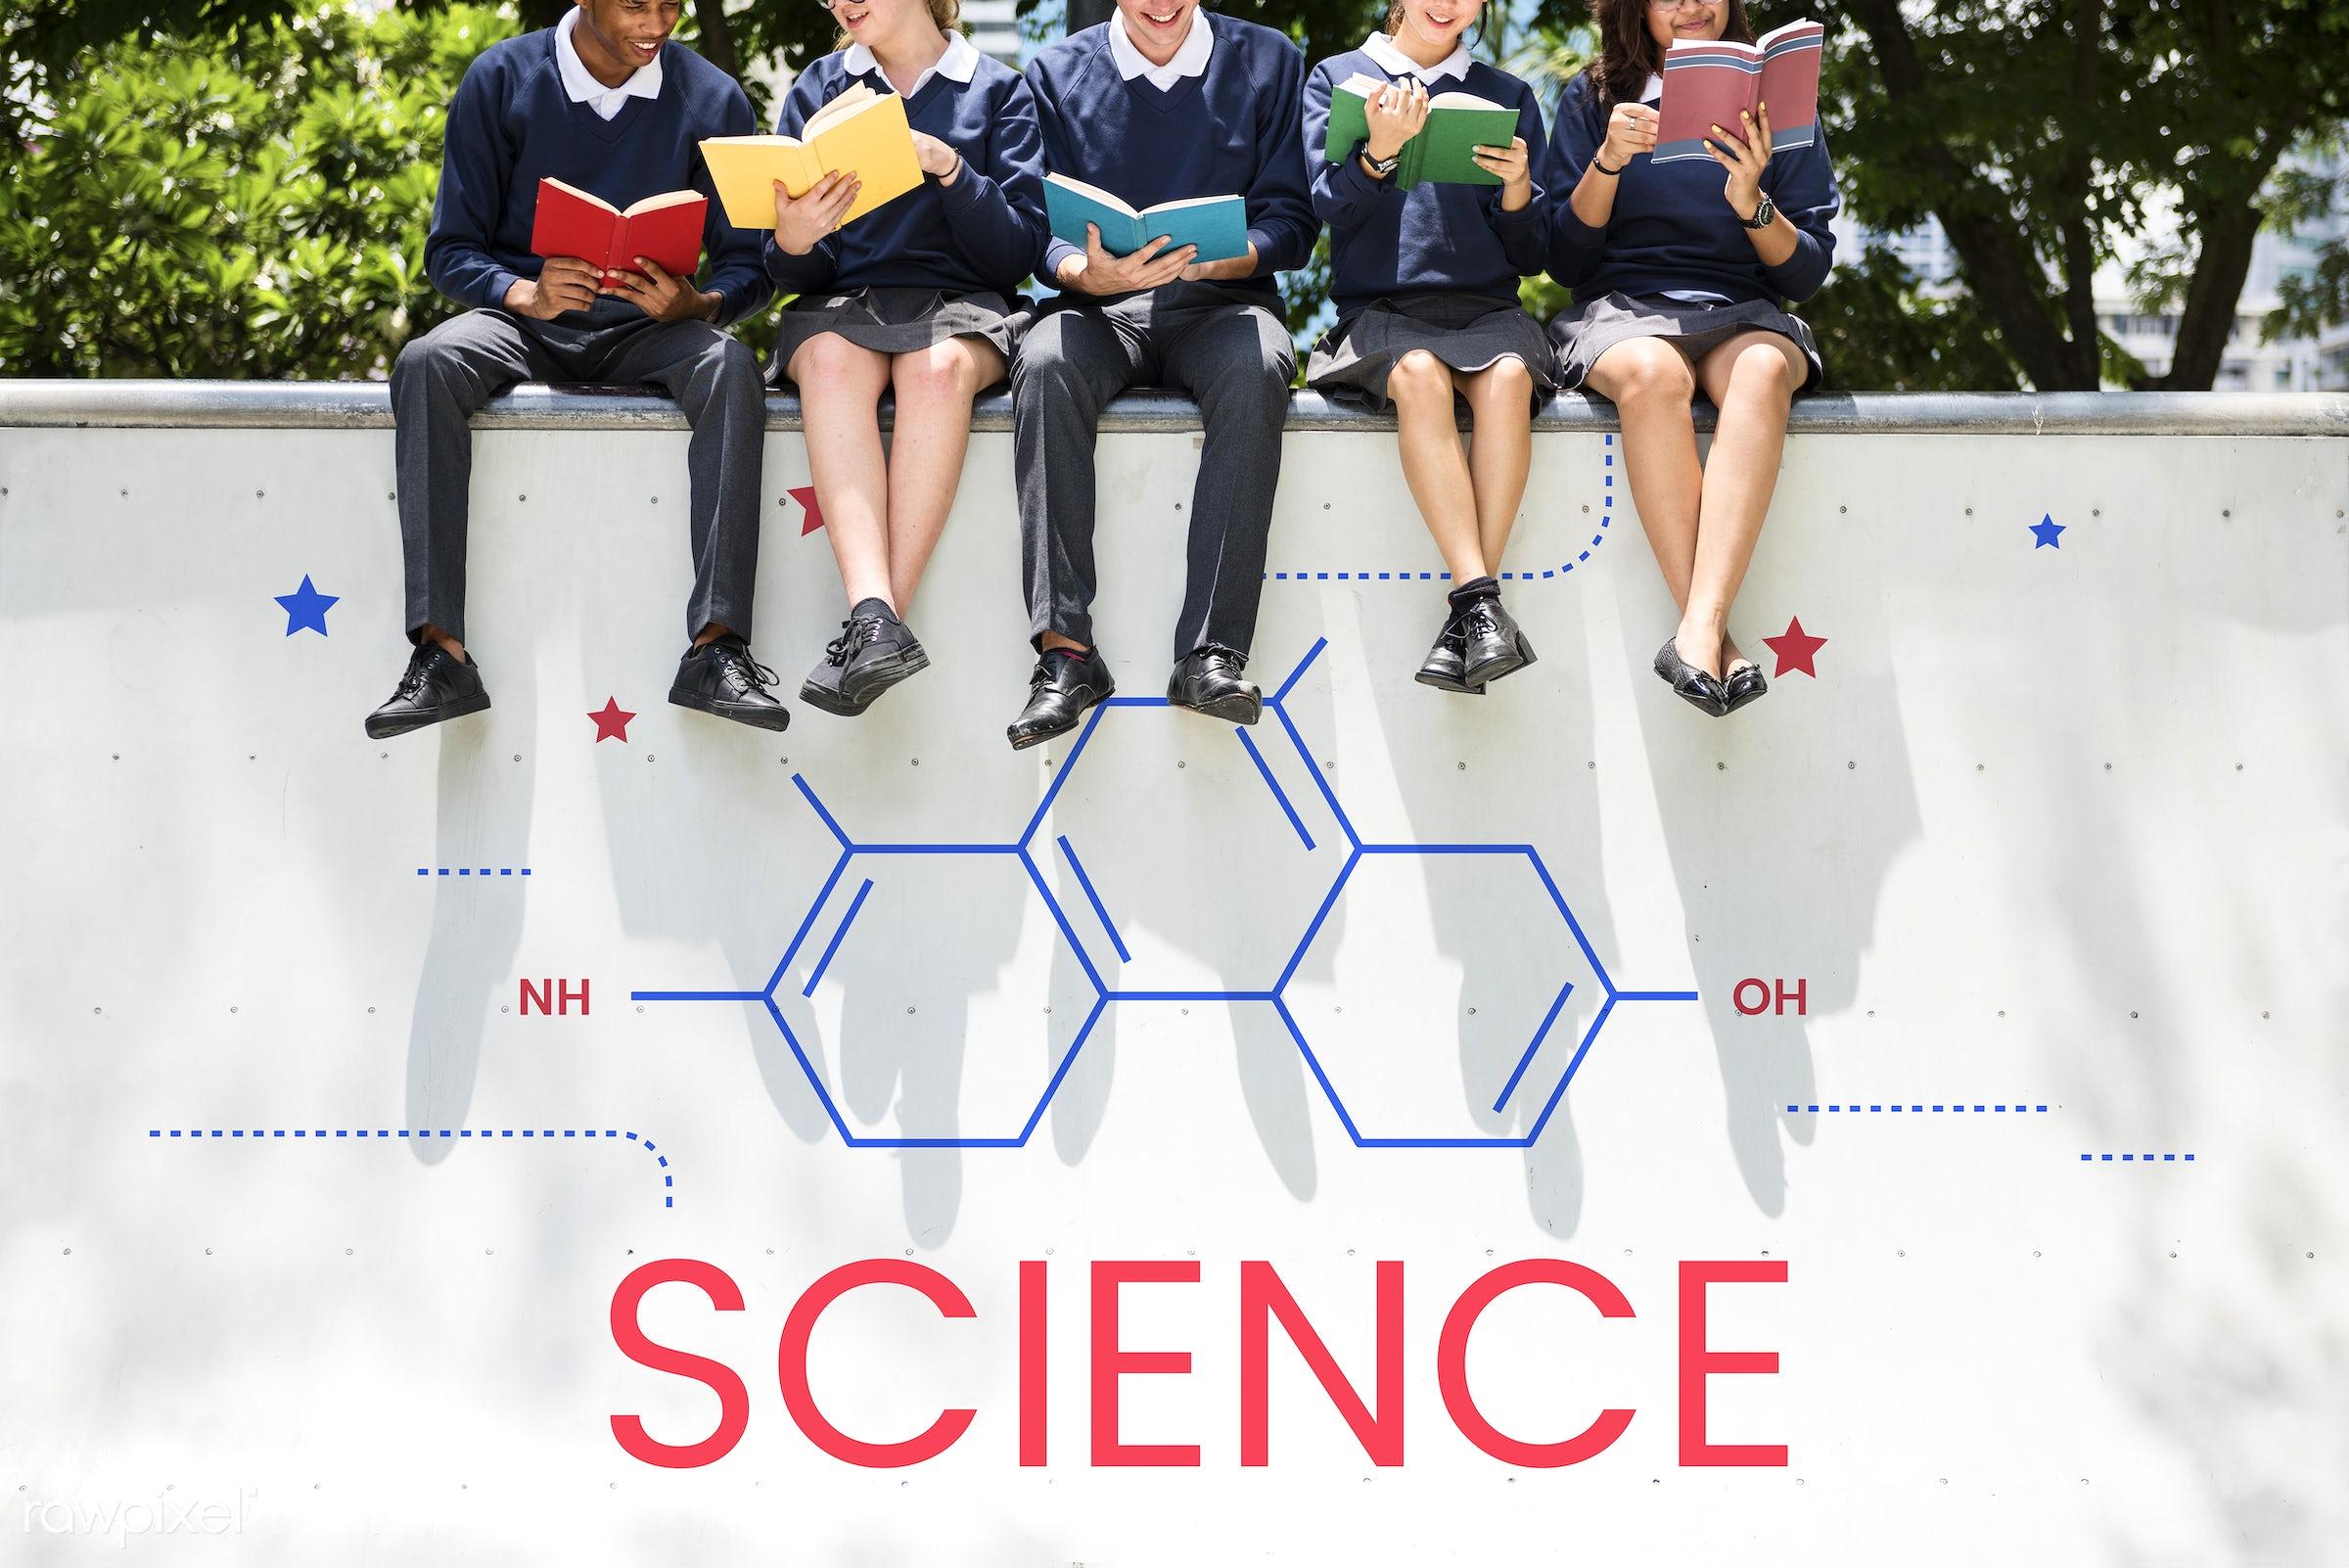 biology, books, chemistry, class, college, discipline, diversity, education, experiment, friends, friendship, high school,...